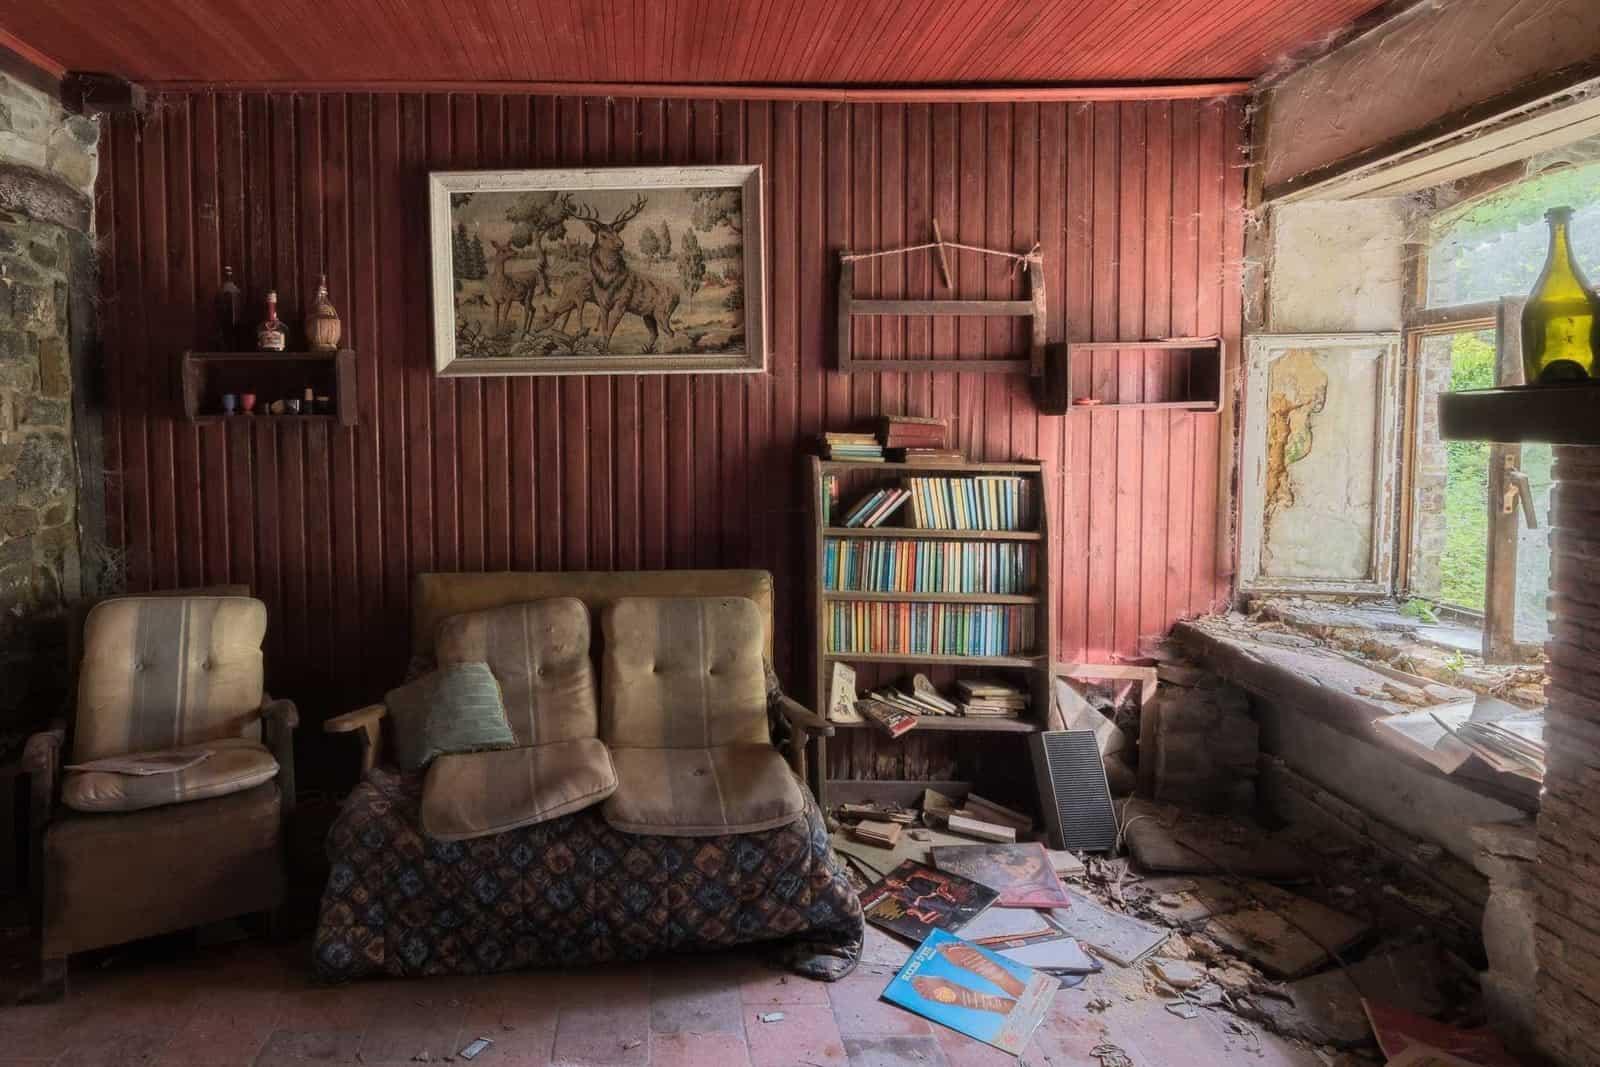 Maison Popeye Featured Image